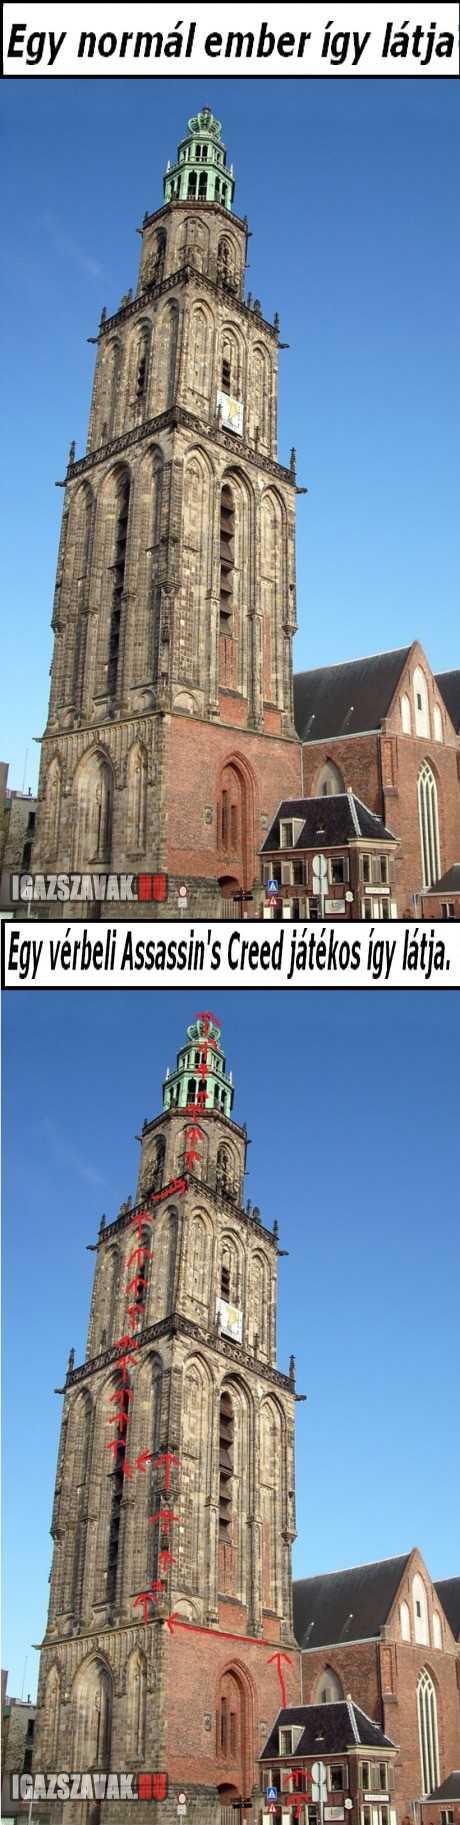 Assassin's Creed látásmód